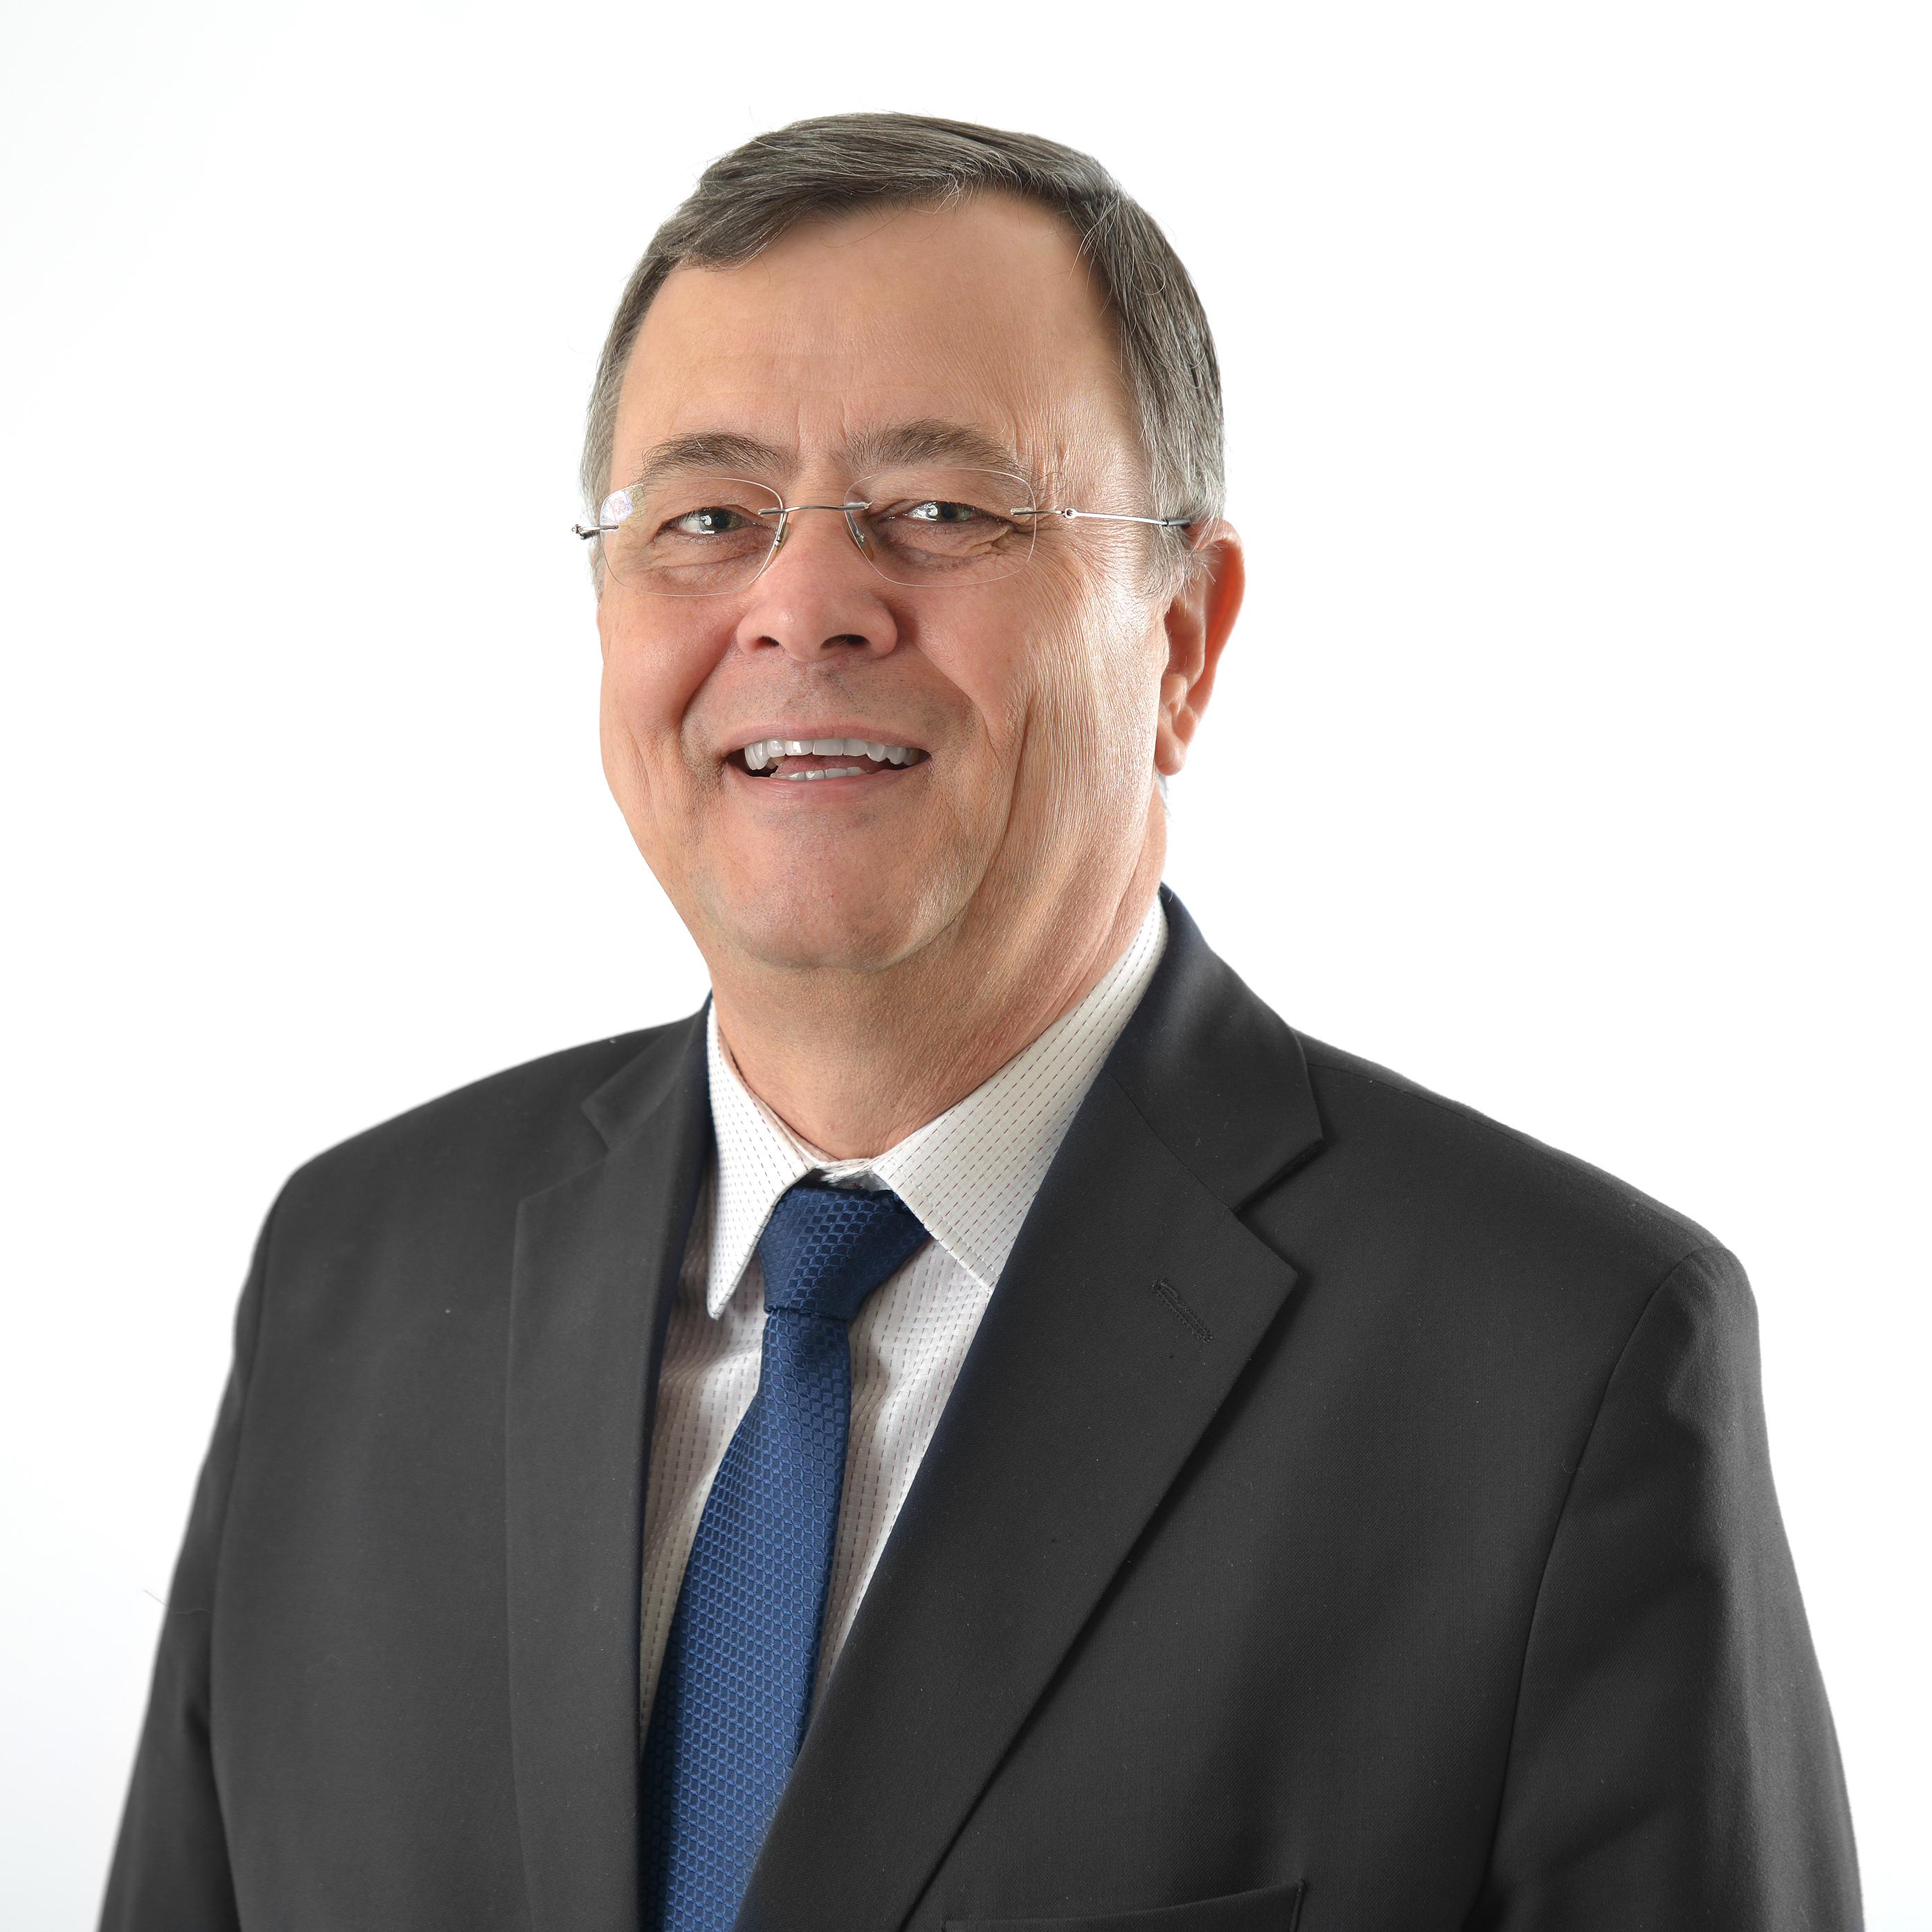 Silas Gomes de Oliveira Neto